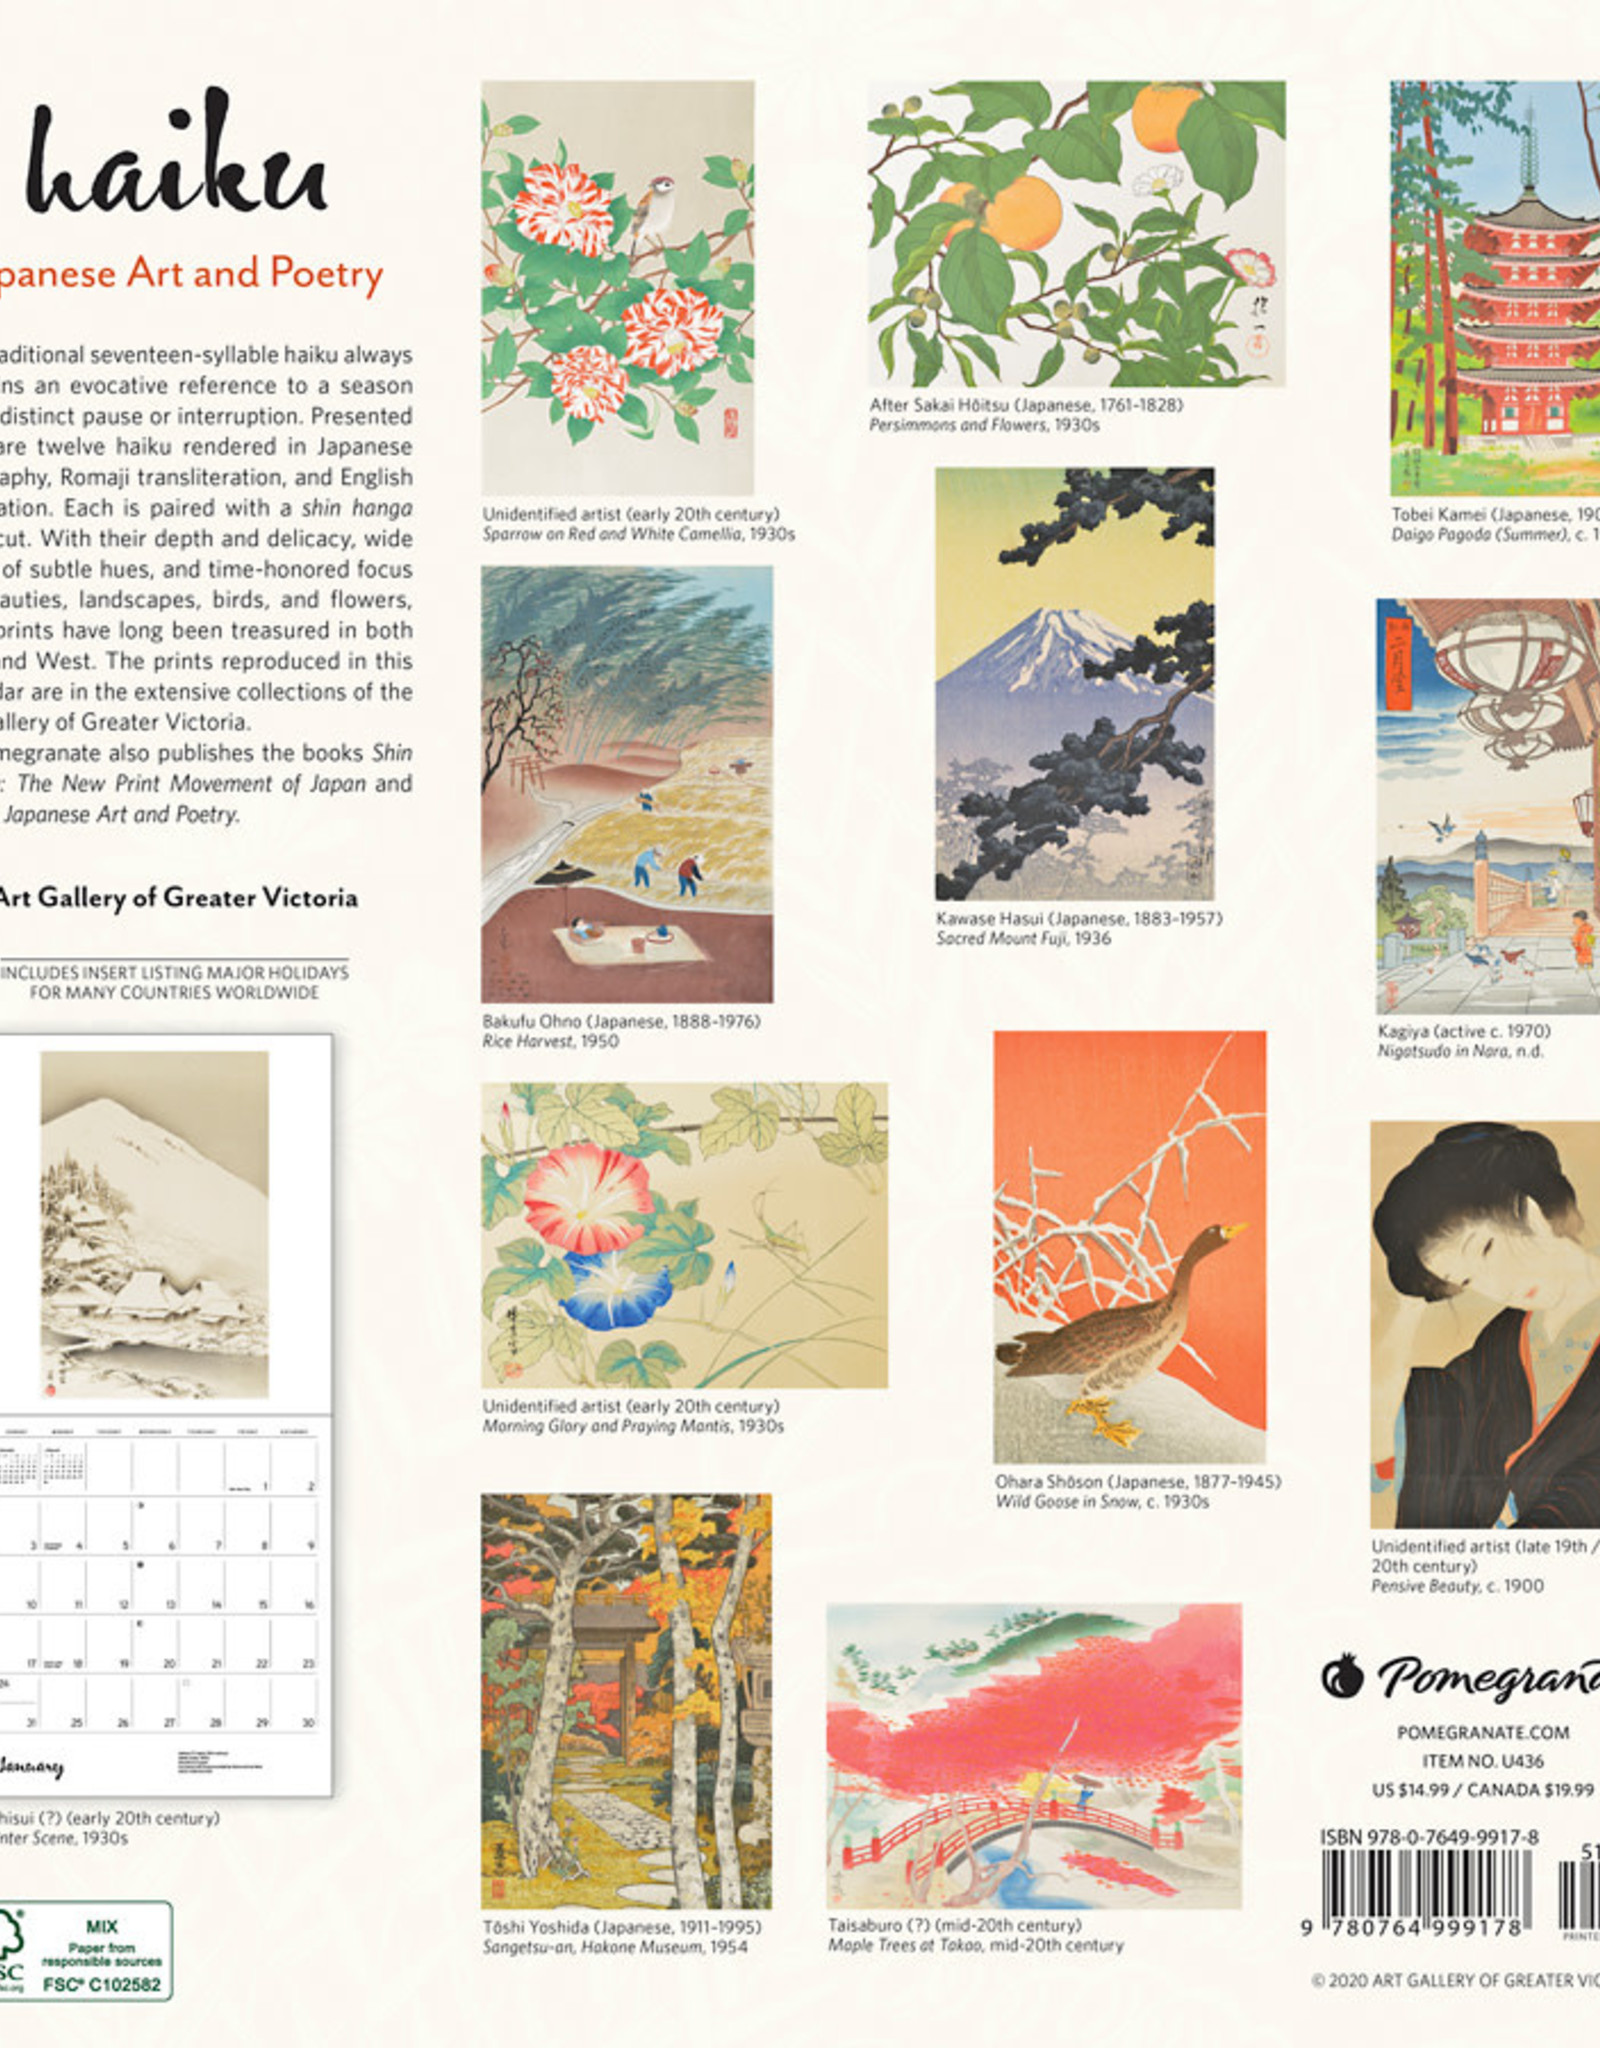 2021 Calendar Haiku: Japanese Art And Poetry